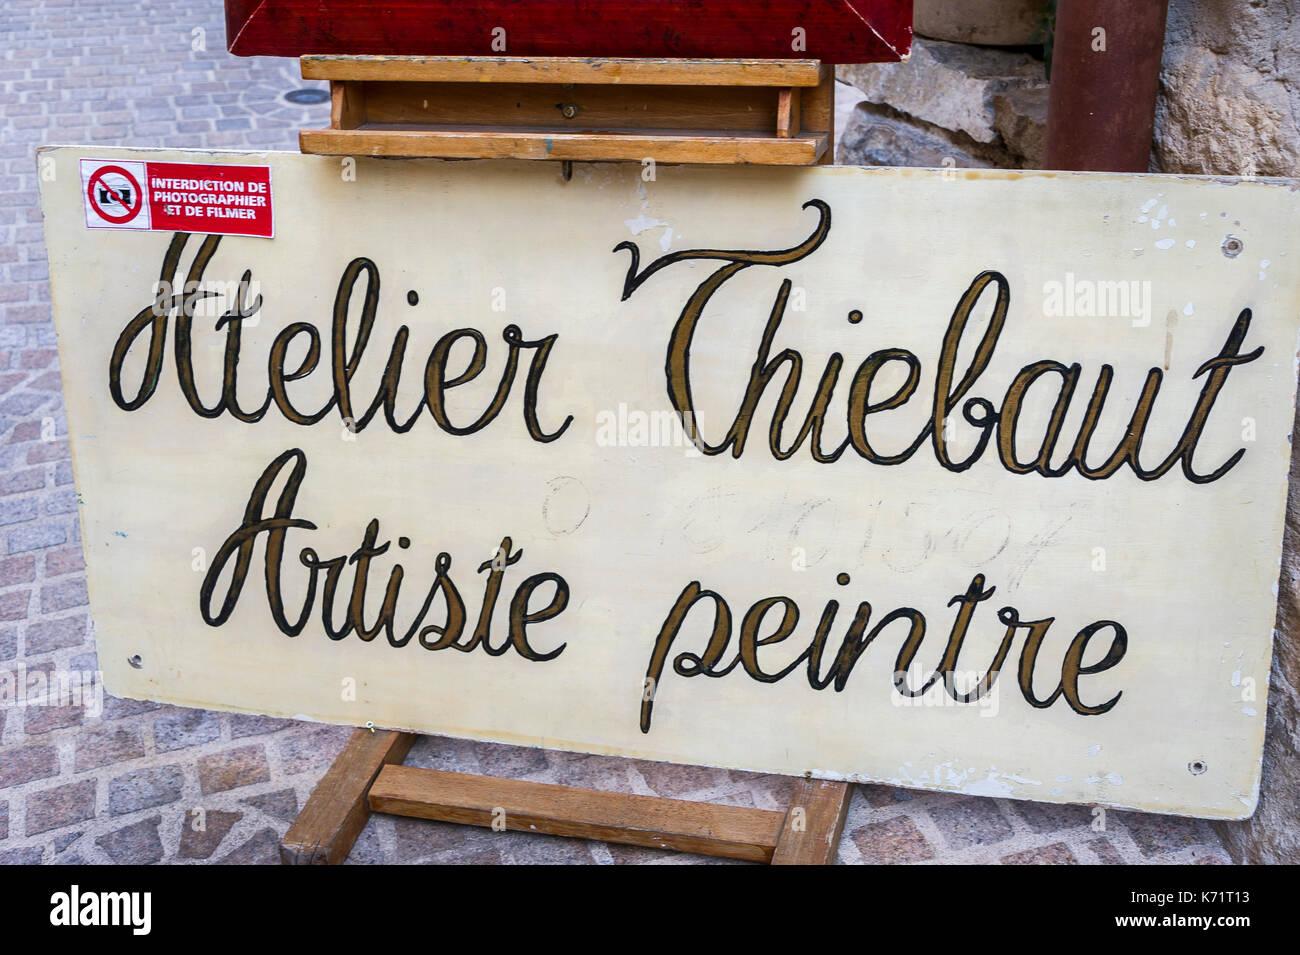 Atelier Thiebaul Artiste Peintre Village Medieval du Castellet Var France - Stock Image